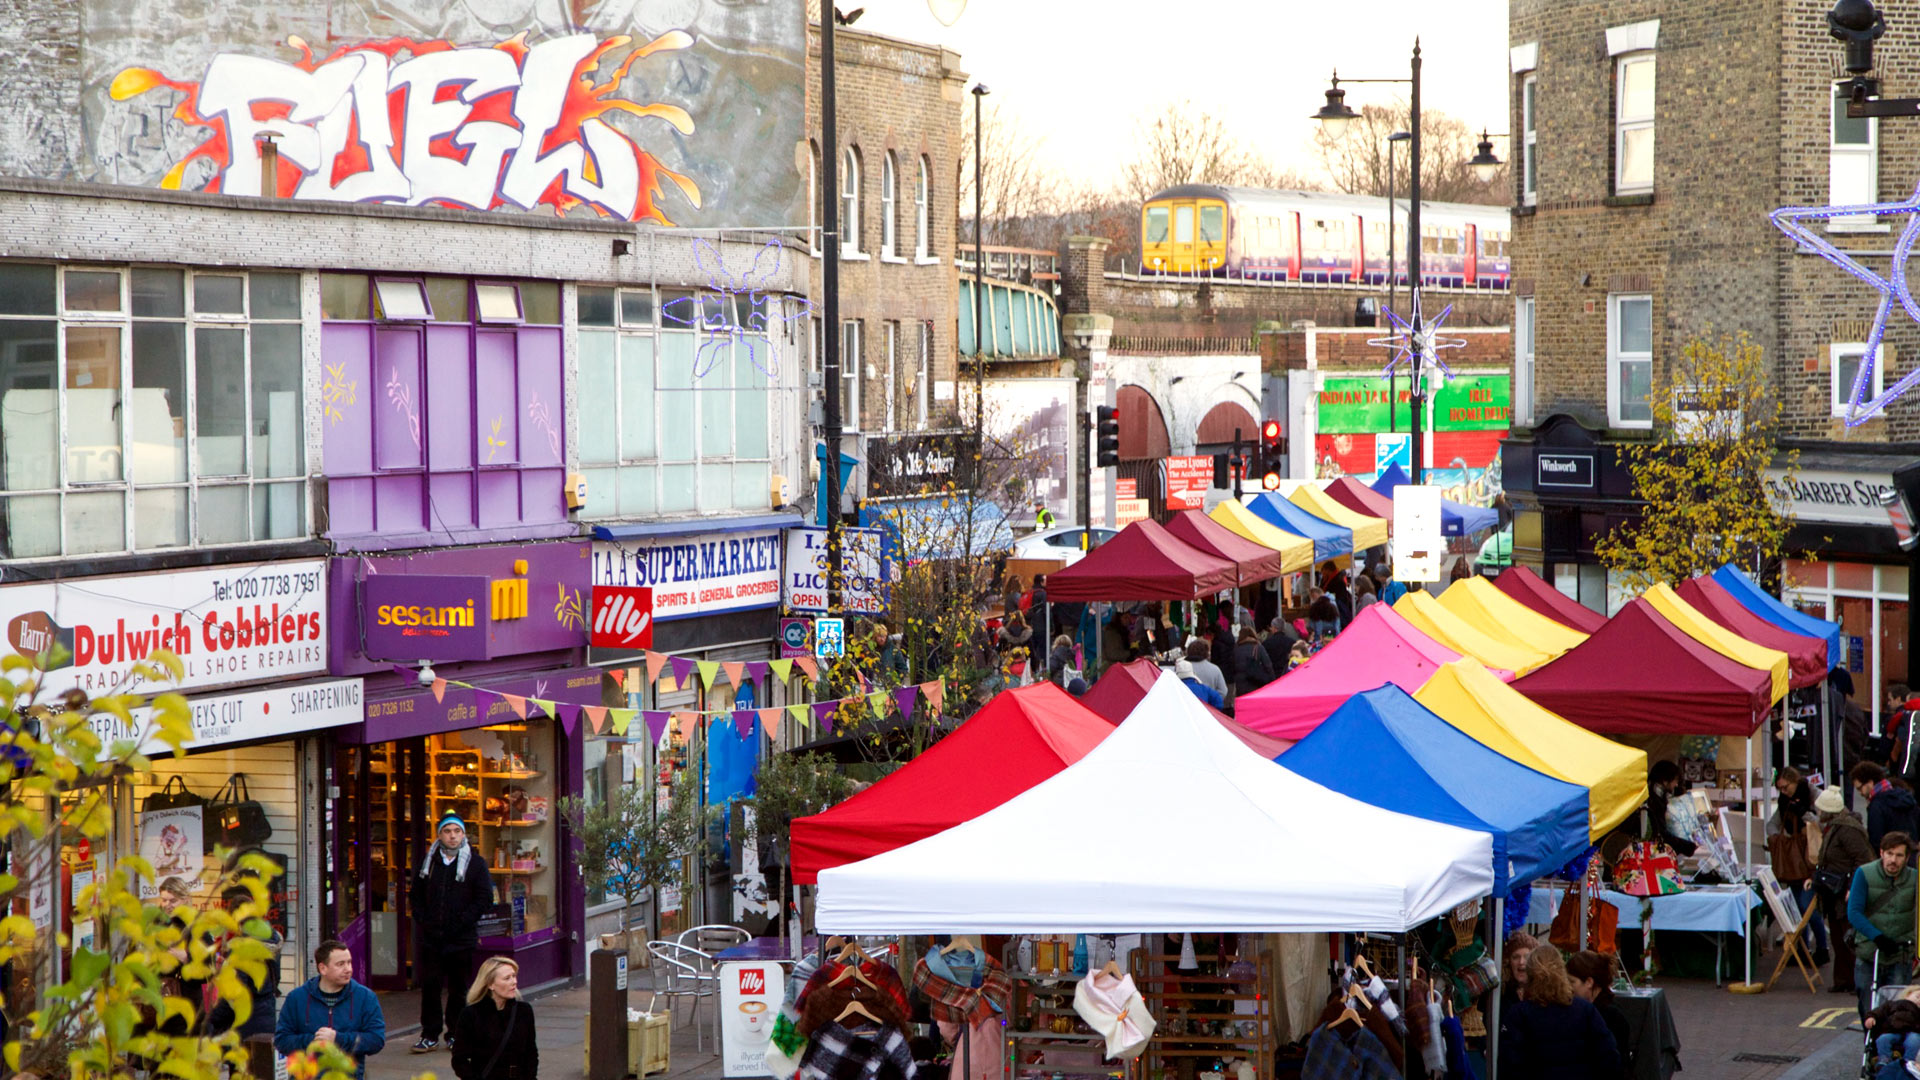 Herne Hill market on Railton Rd, SE24